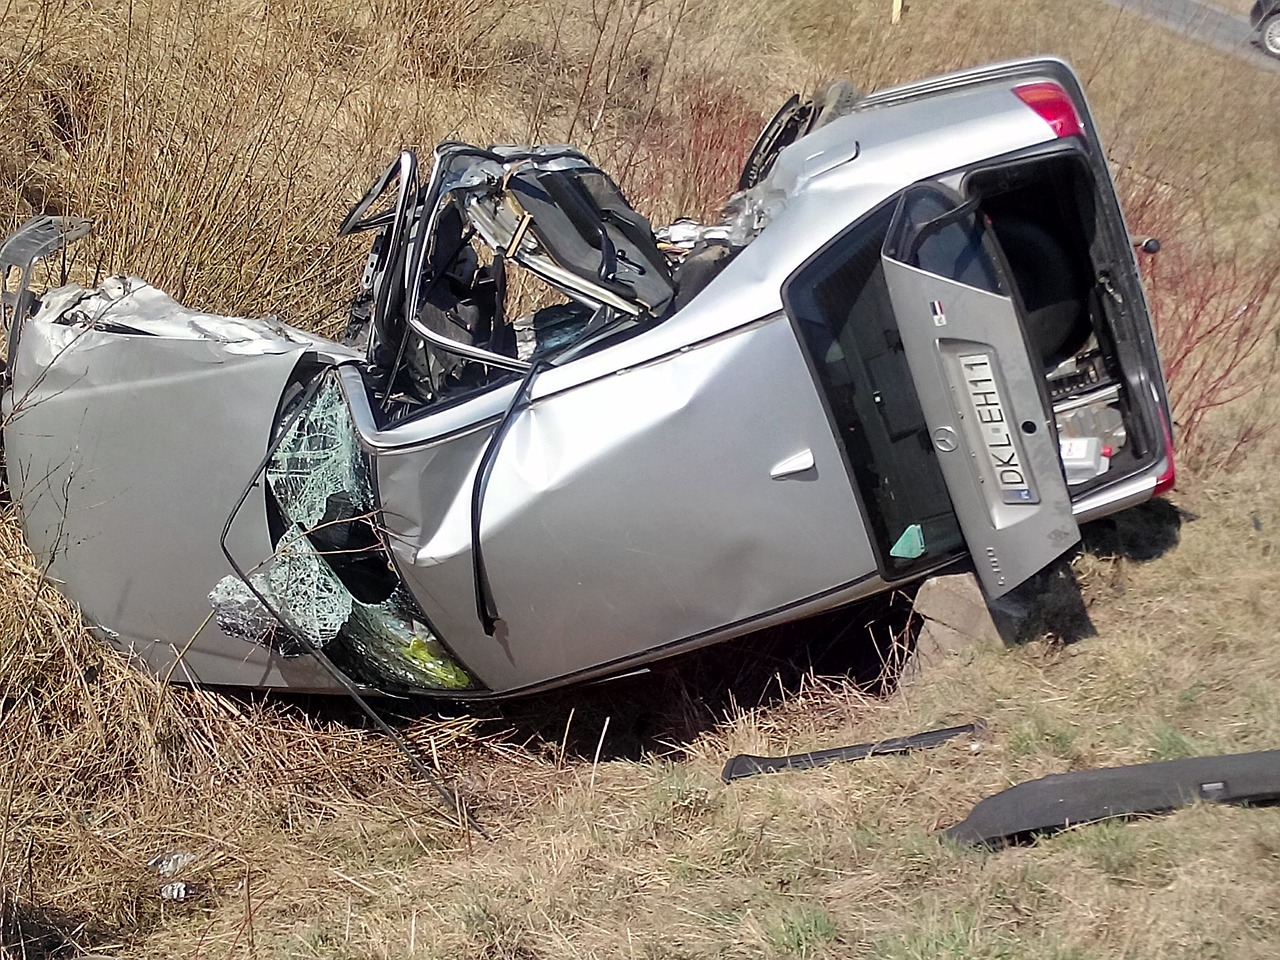 Rollover Accident Fatally Injures Man Near Modesto